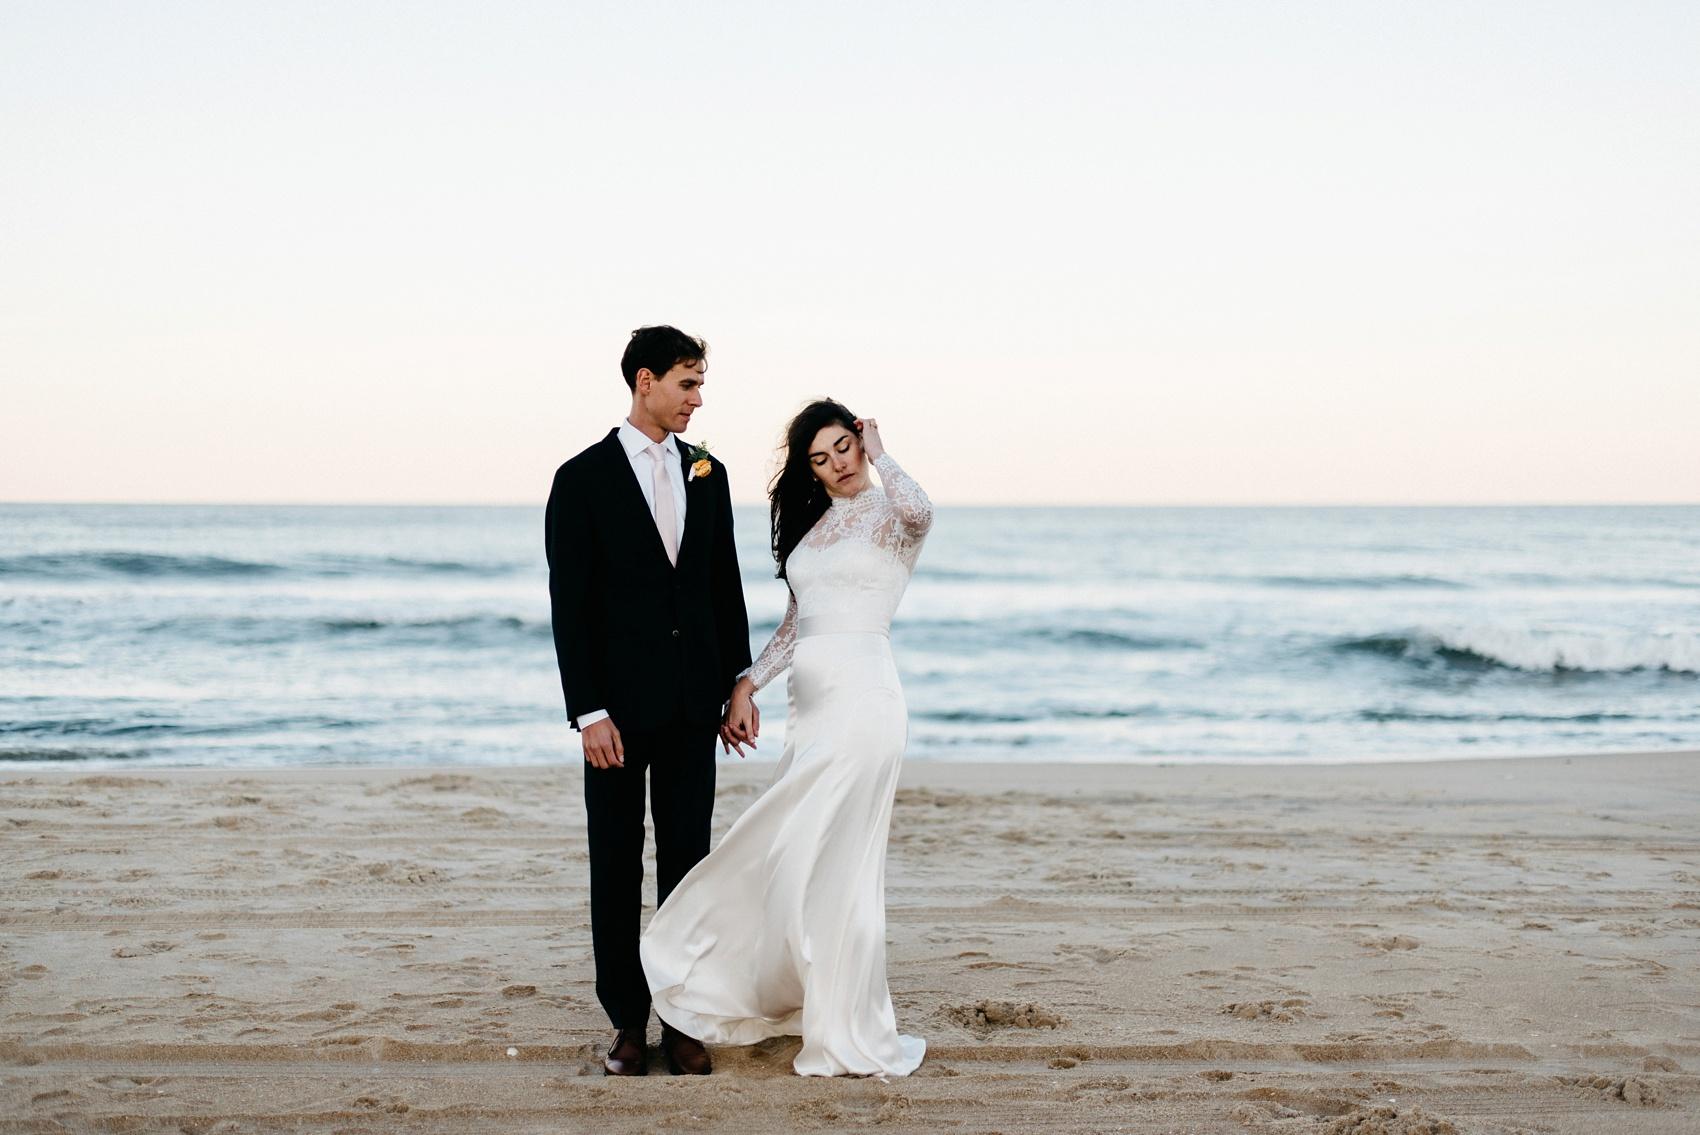 outerbanks_wedding_photographer_1309.jpg